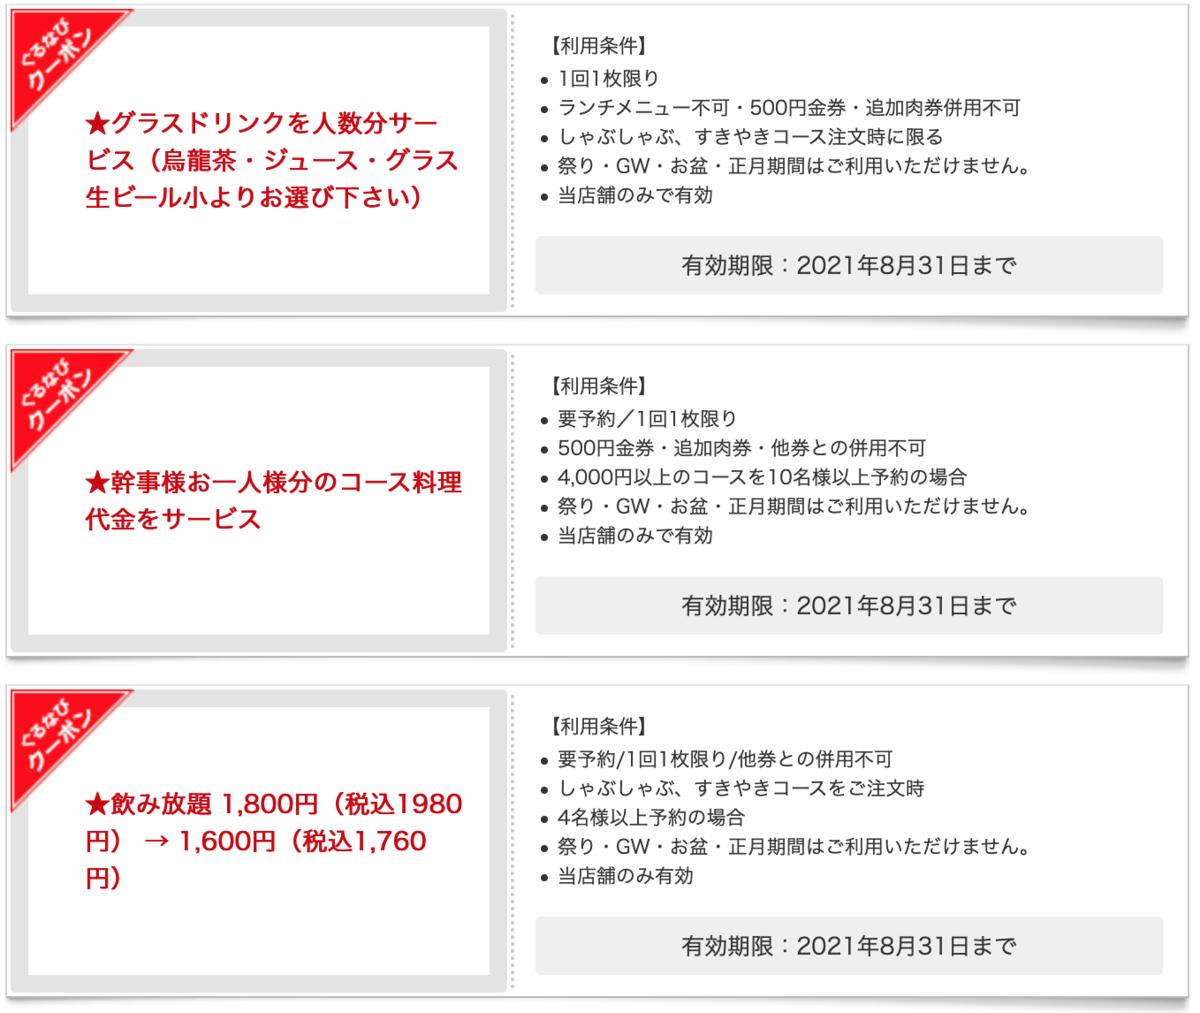 f:id:danpop:20210706125349p:plain